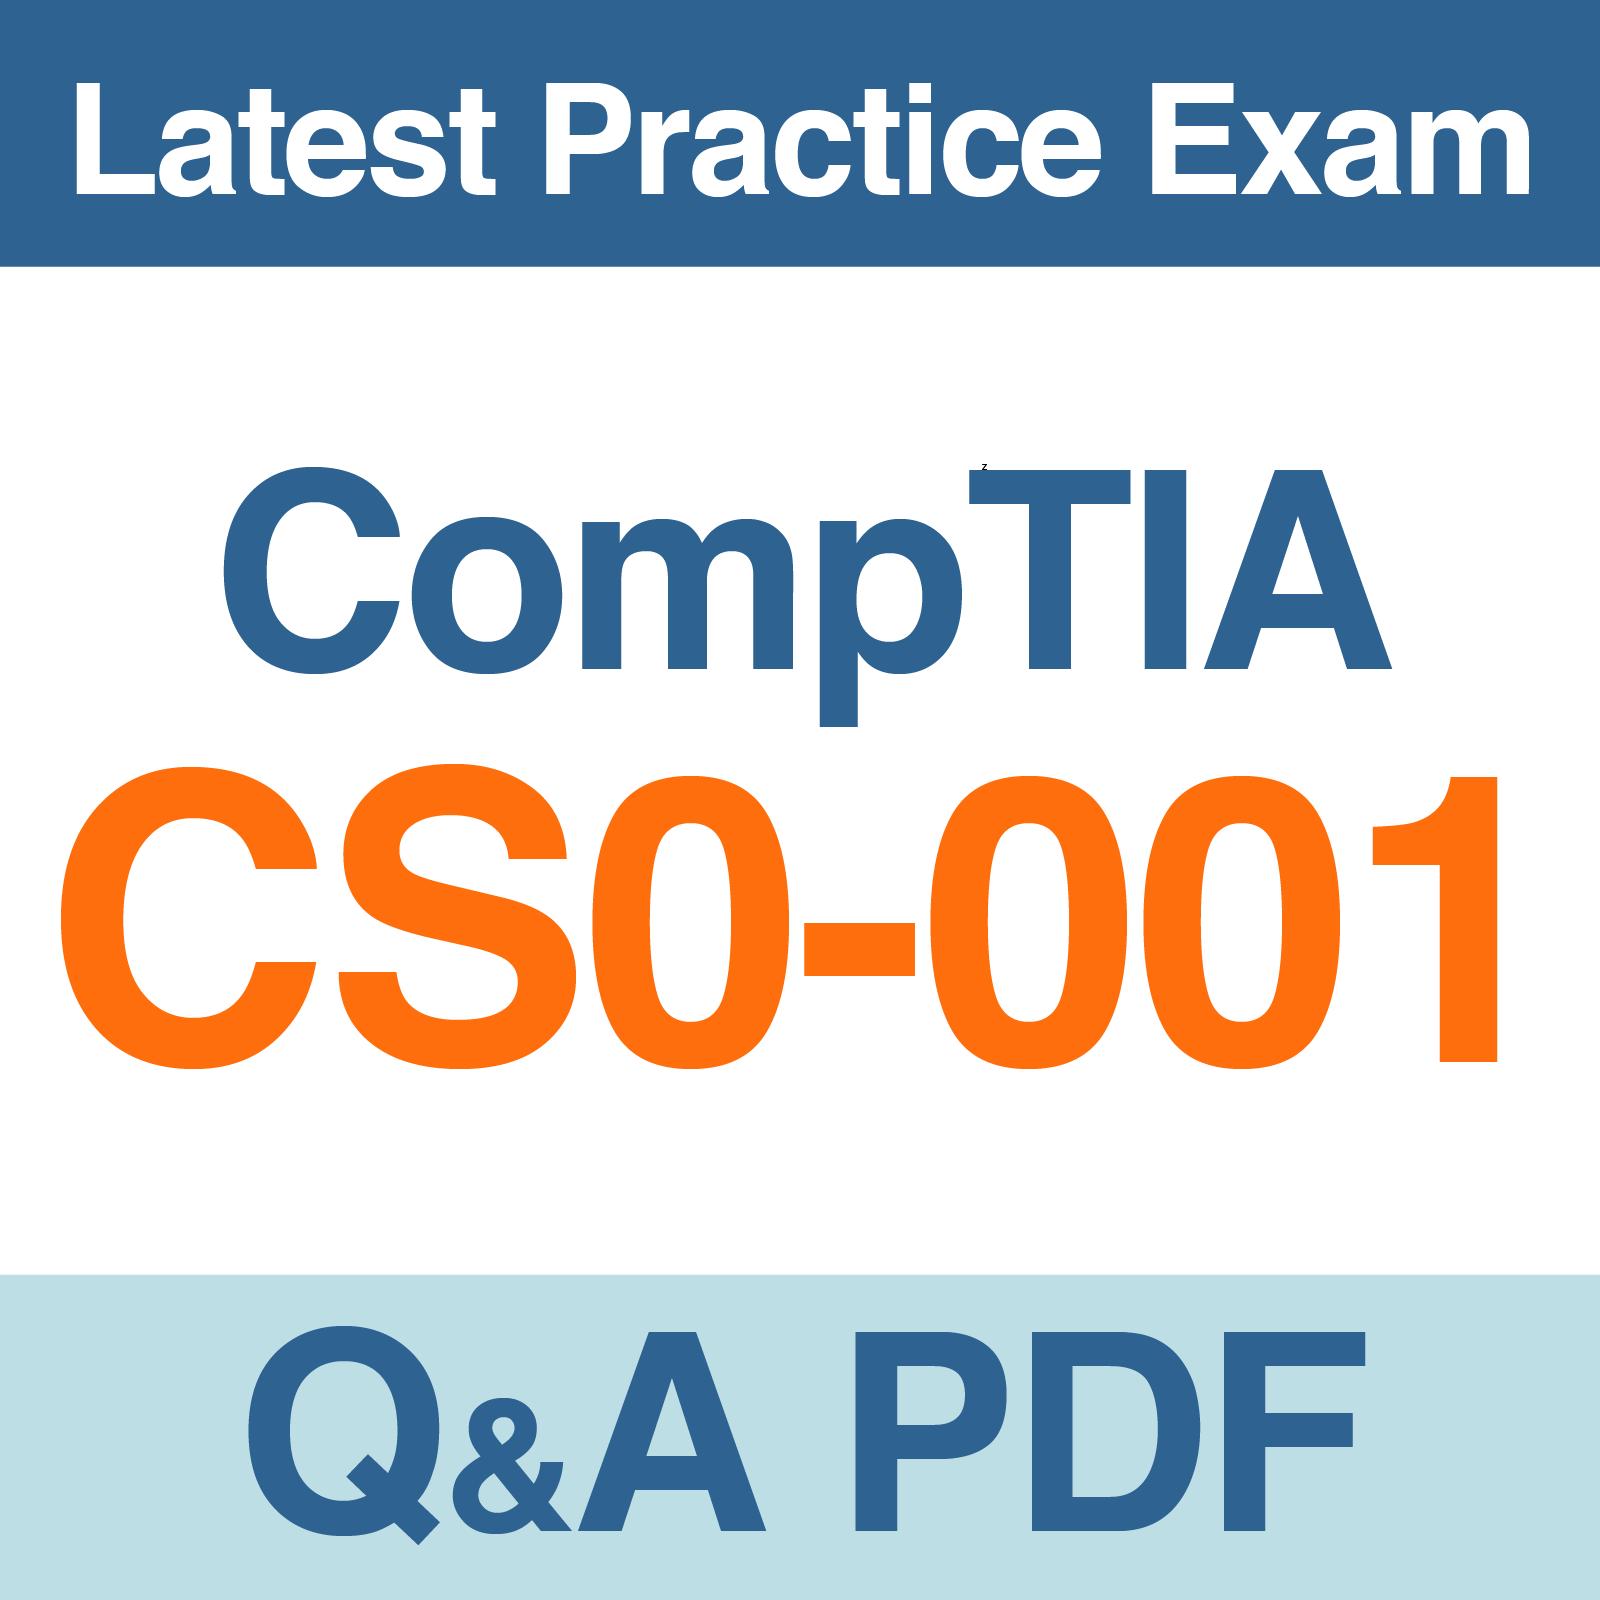 Comptia csa certification exam cs0 001 practice test qa pdf 1betcityfo Choice Image